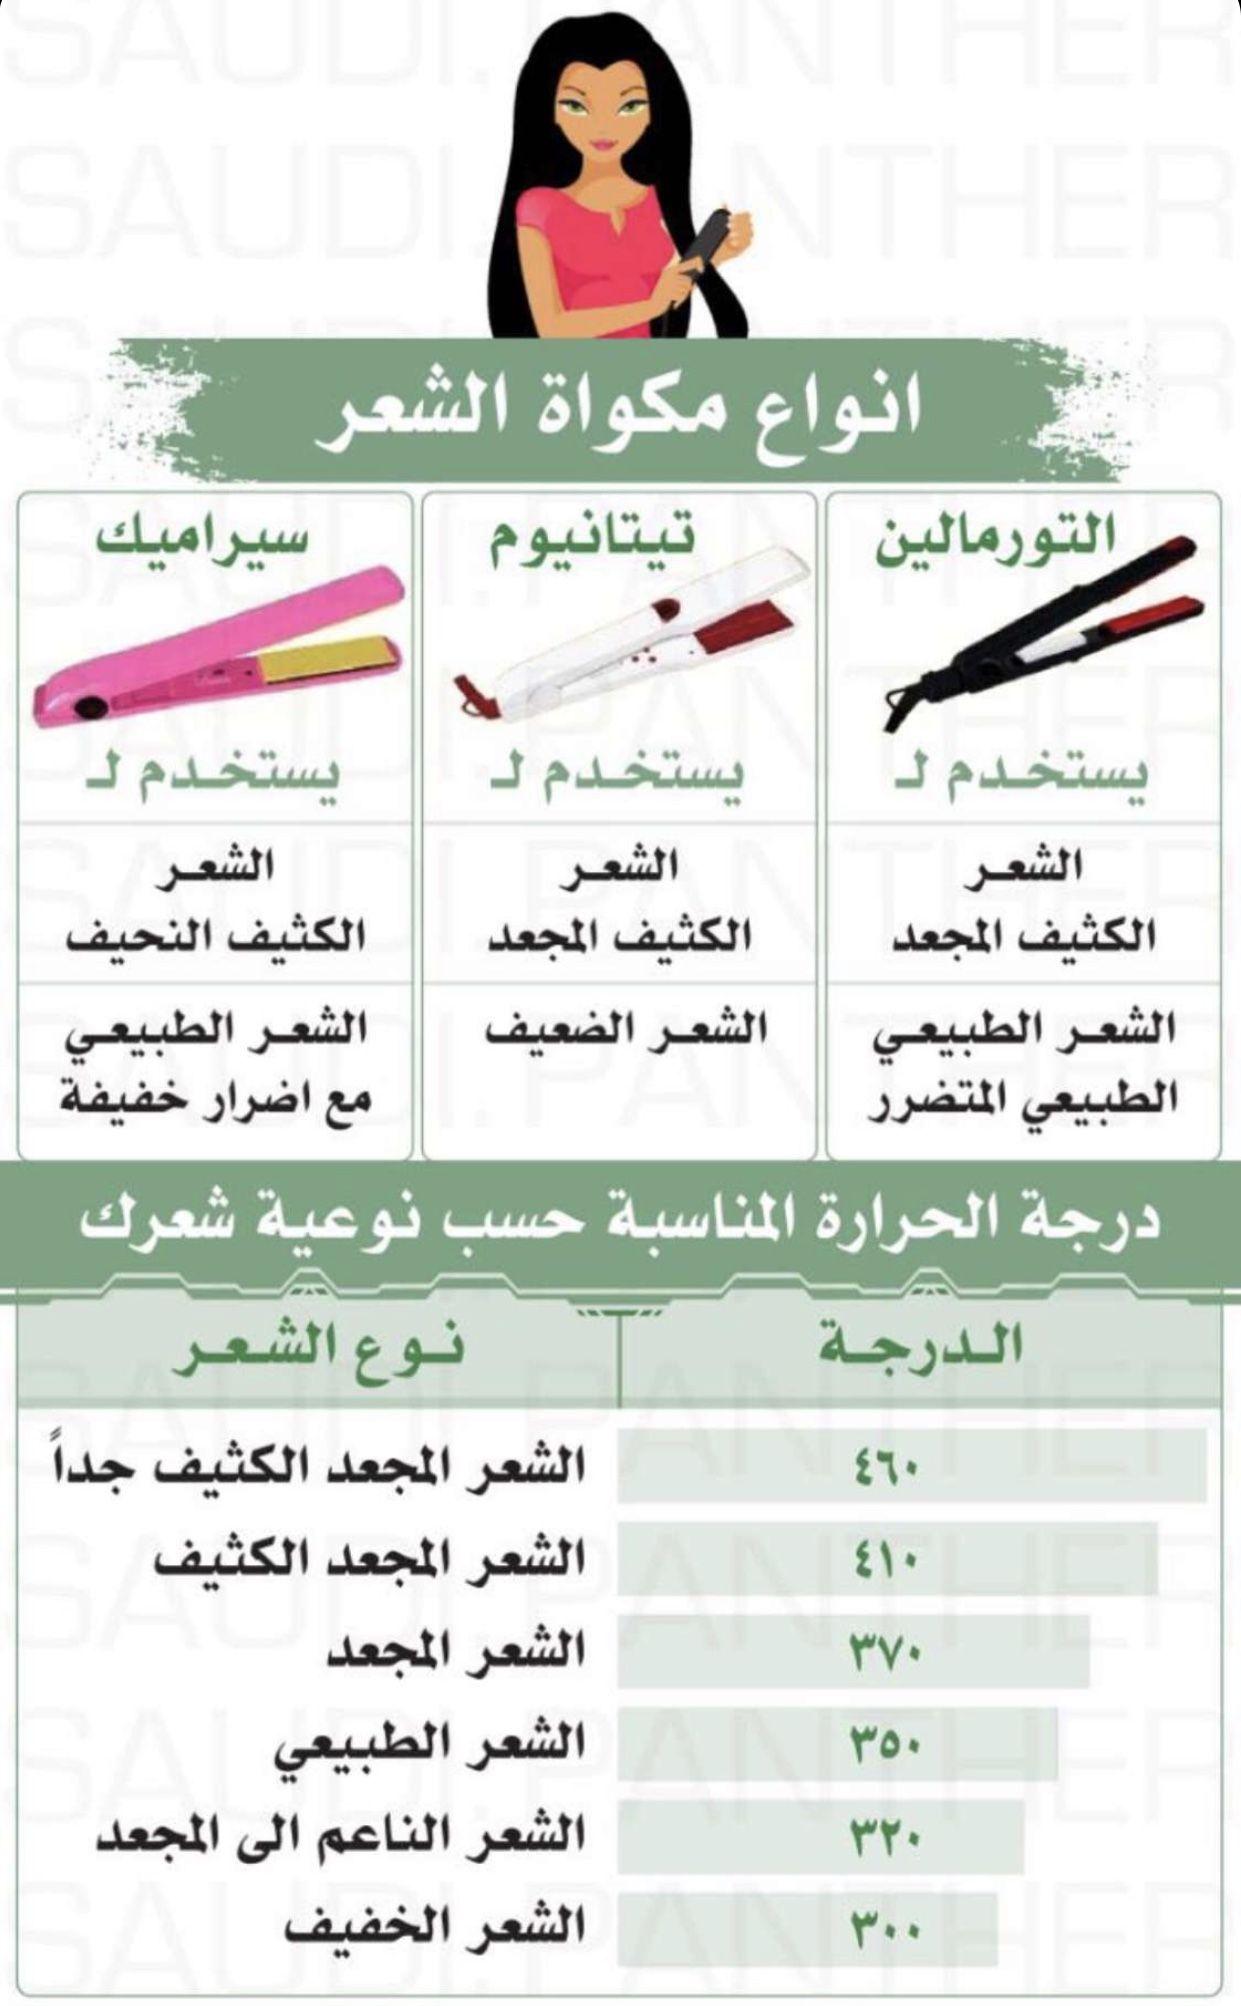 Pin By Re0o0ry ه م س ات ع اب ر ة On Hair Styles تسريحات الشعر Beauty Recipes Hair Hair Care Recipes Beauty Skin Care Routine